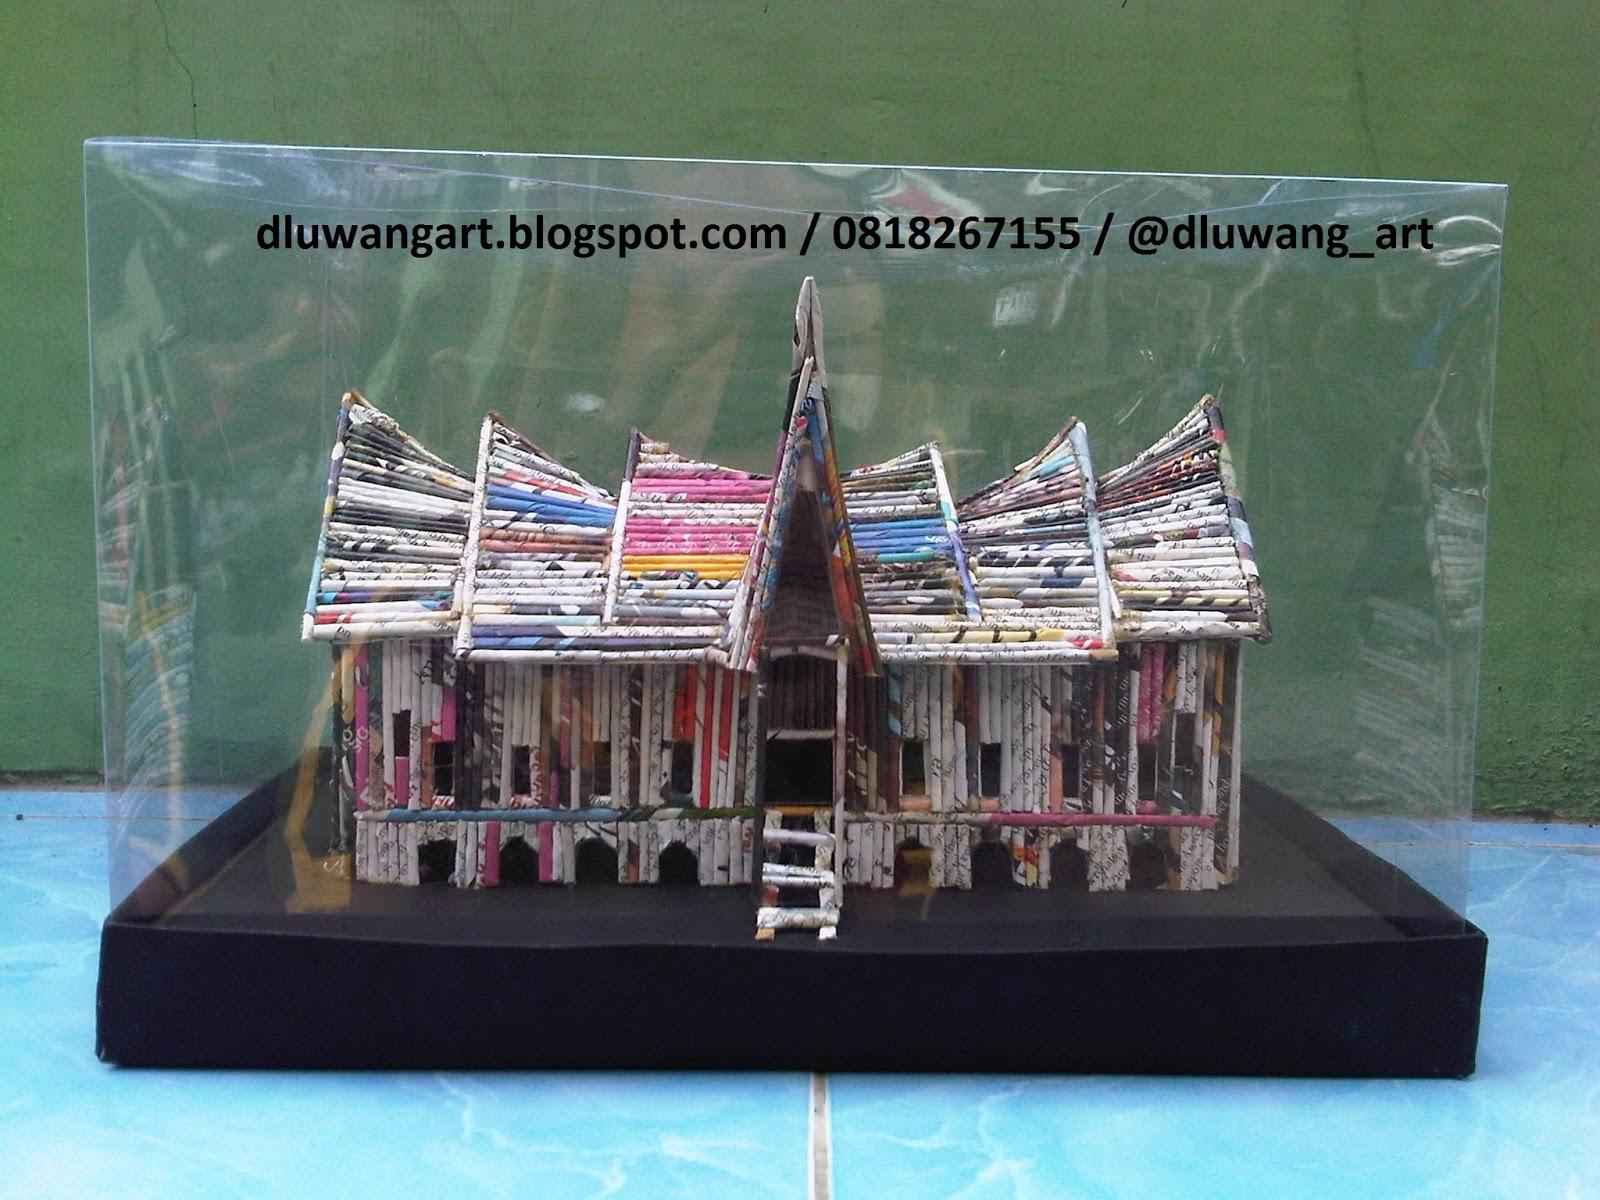 DluwangArt Kerajinan Kertas Koran Bekas: Produk Miniatur